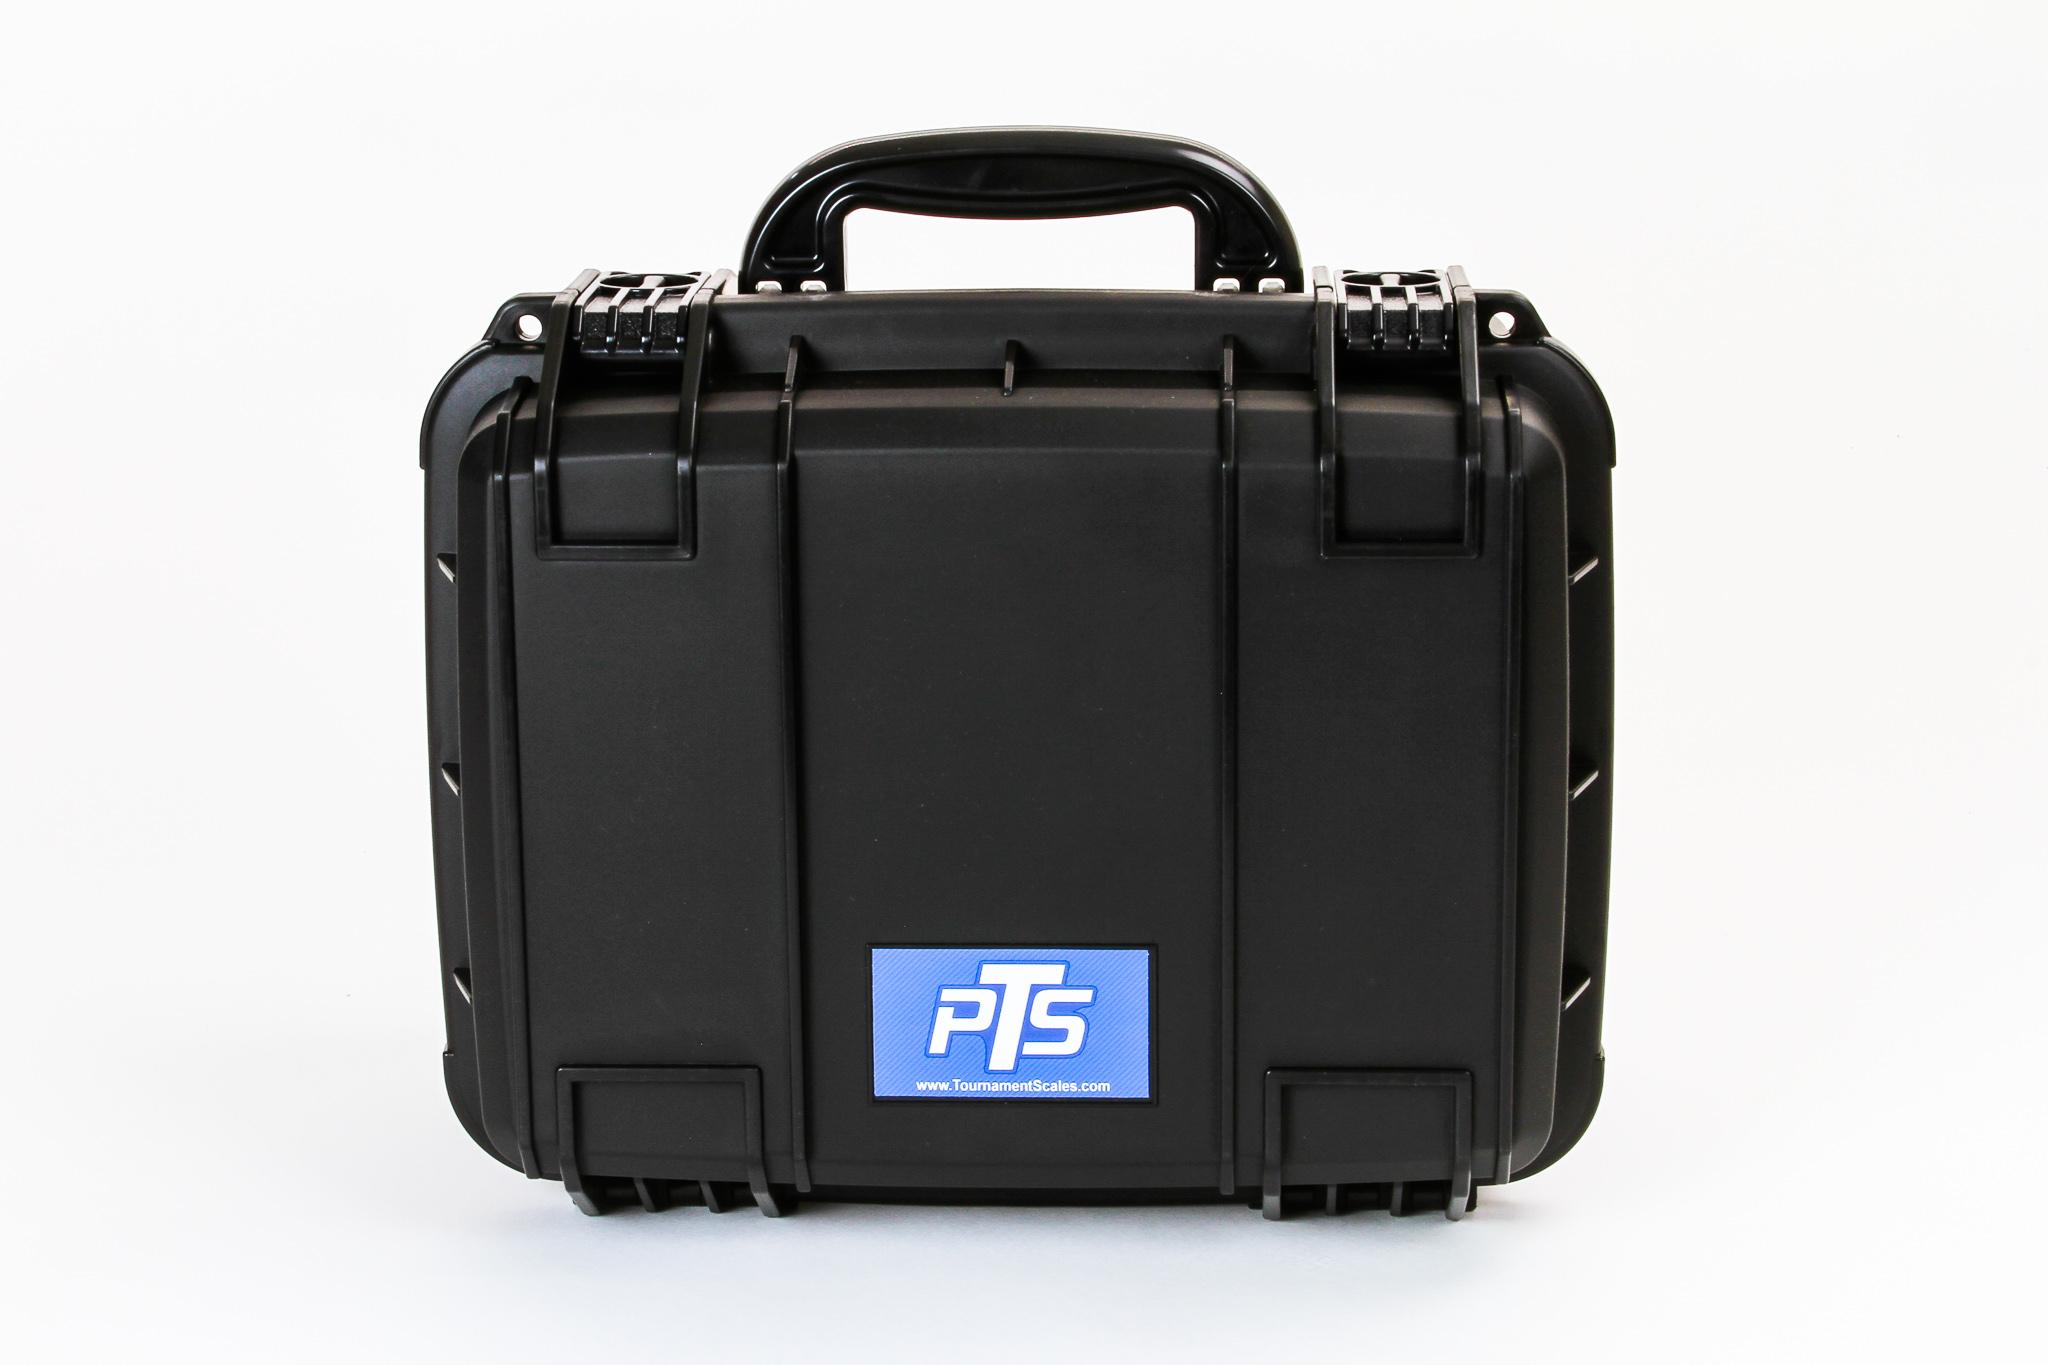 Waterproof Storage Case for Printer